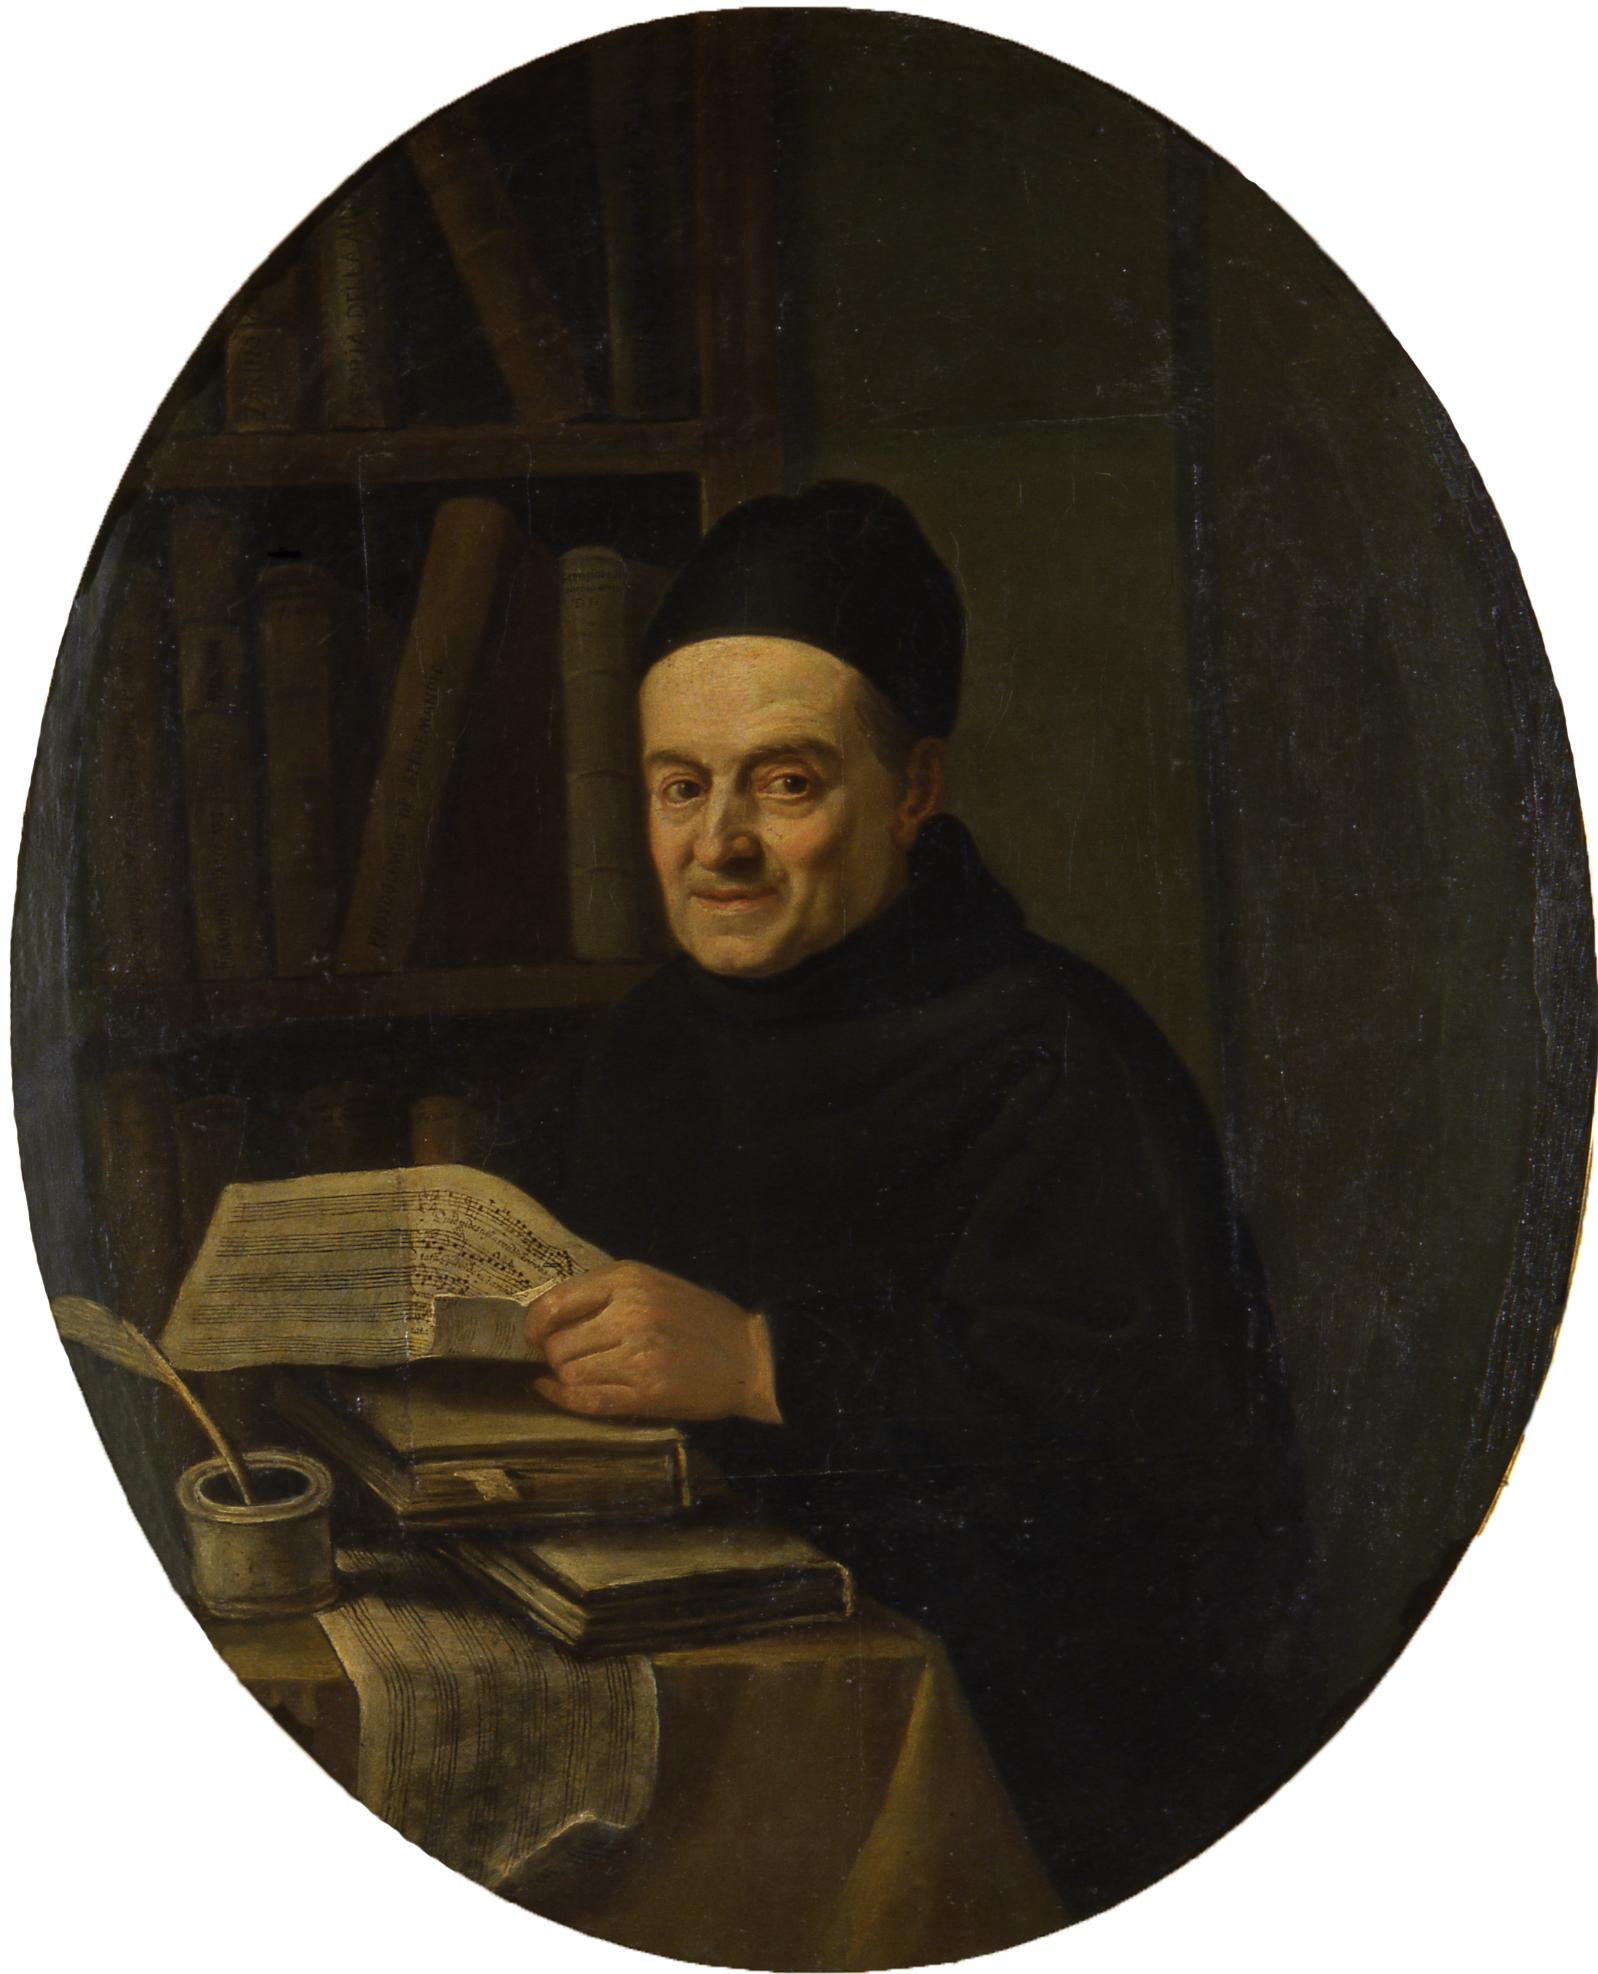 Archivo:Padre Martini 1.jpg